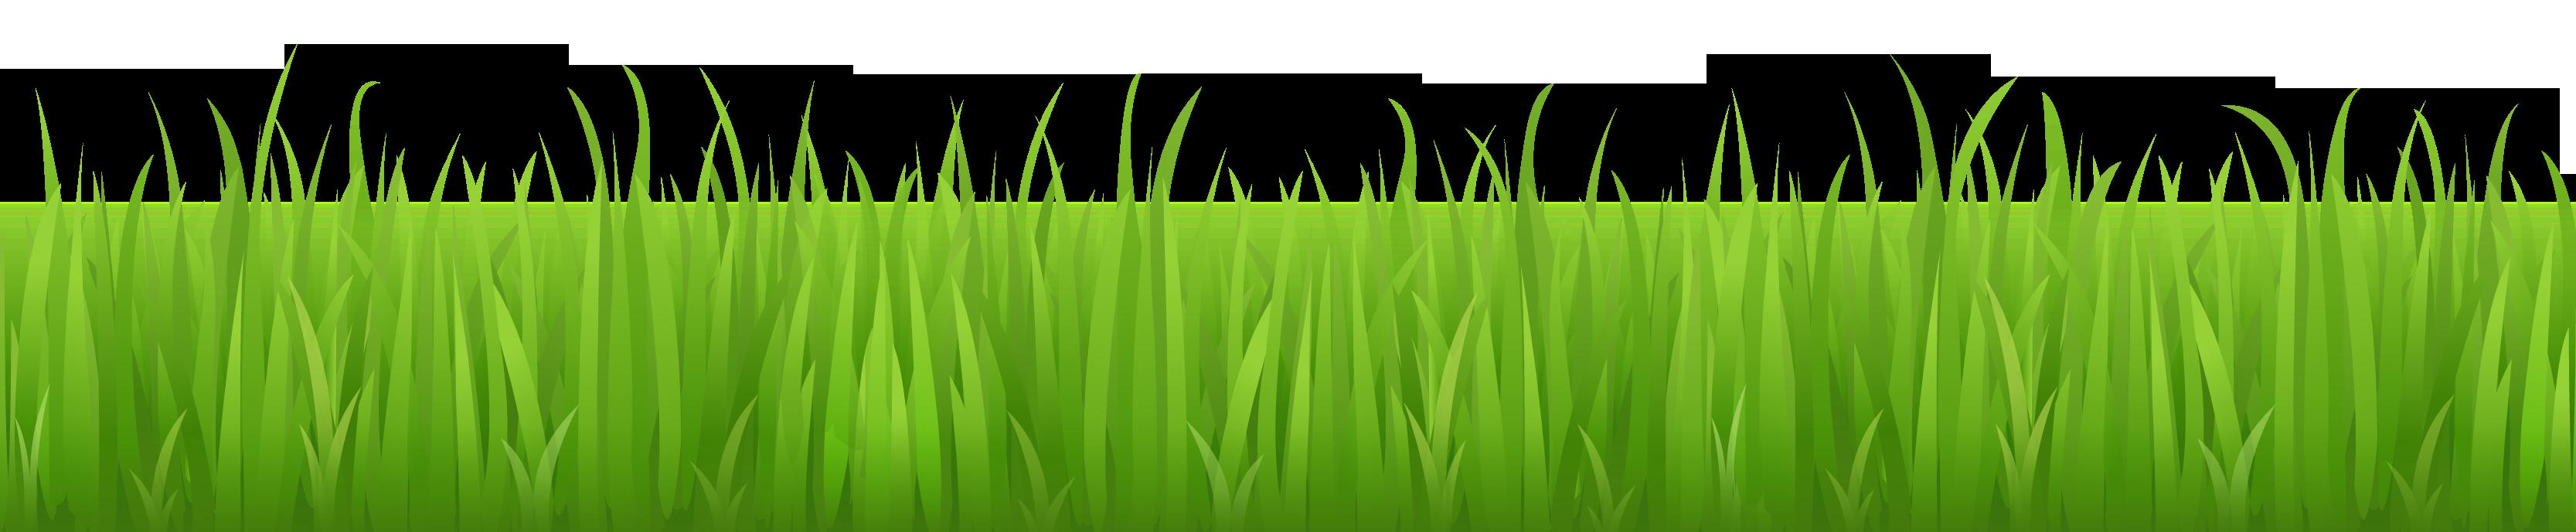 Green grass clipart - Clipground